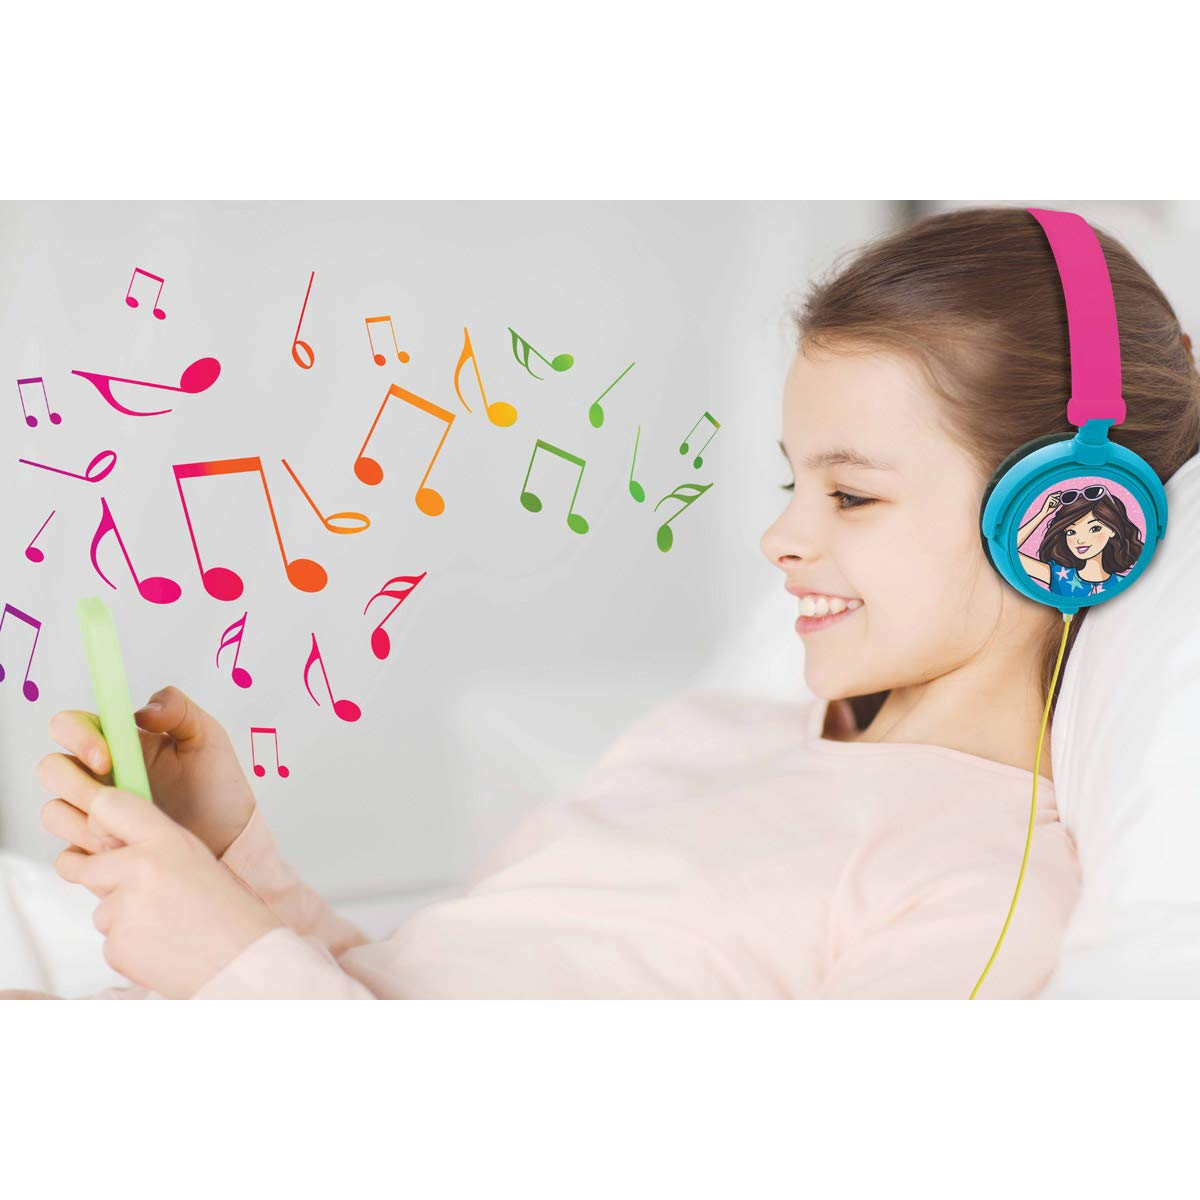 Cuffie Stereo HP010BB Pieghevole e Regolabile Alimentazione a Misura di Bambino Rosa LEXIBOOK Barbie